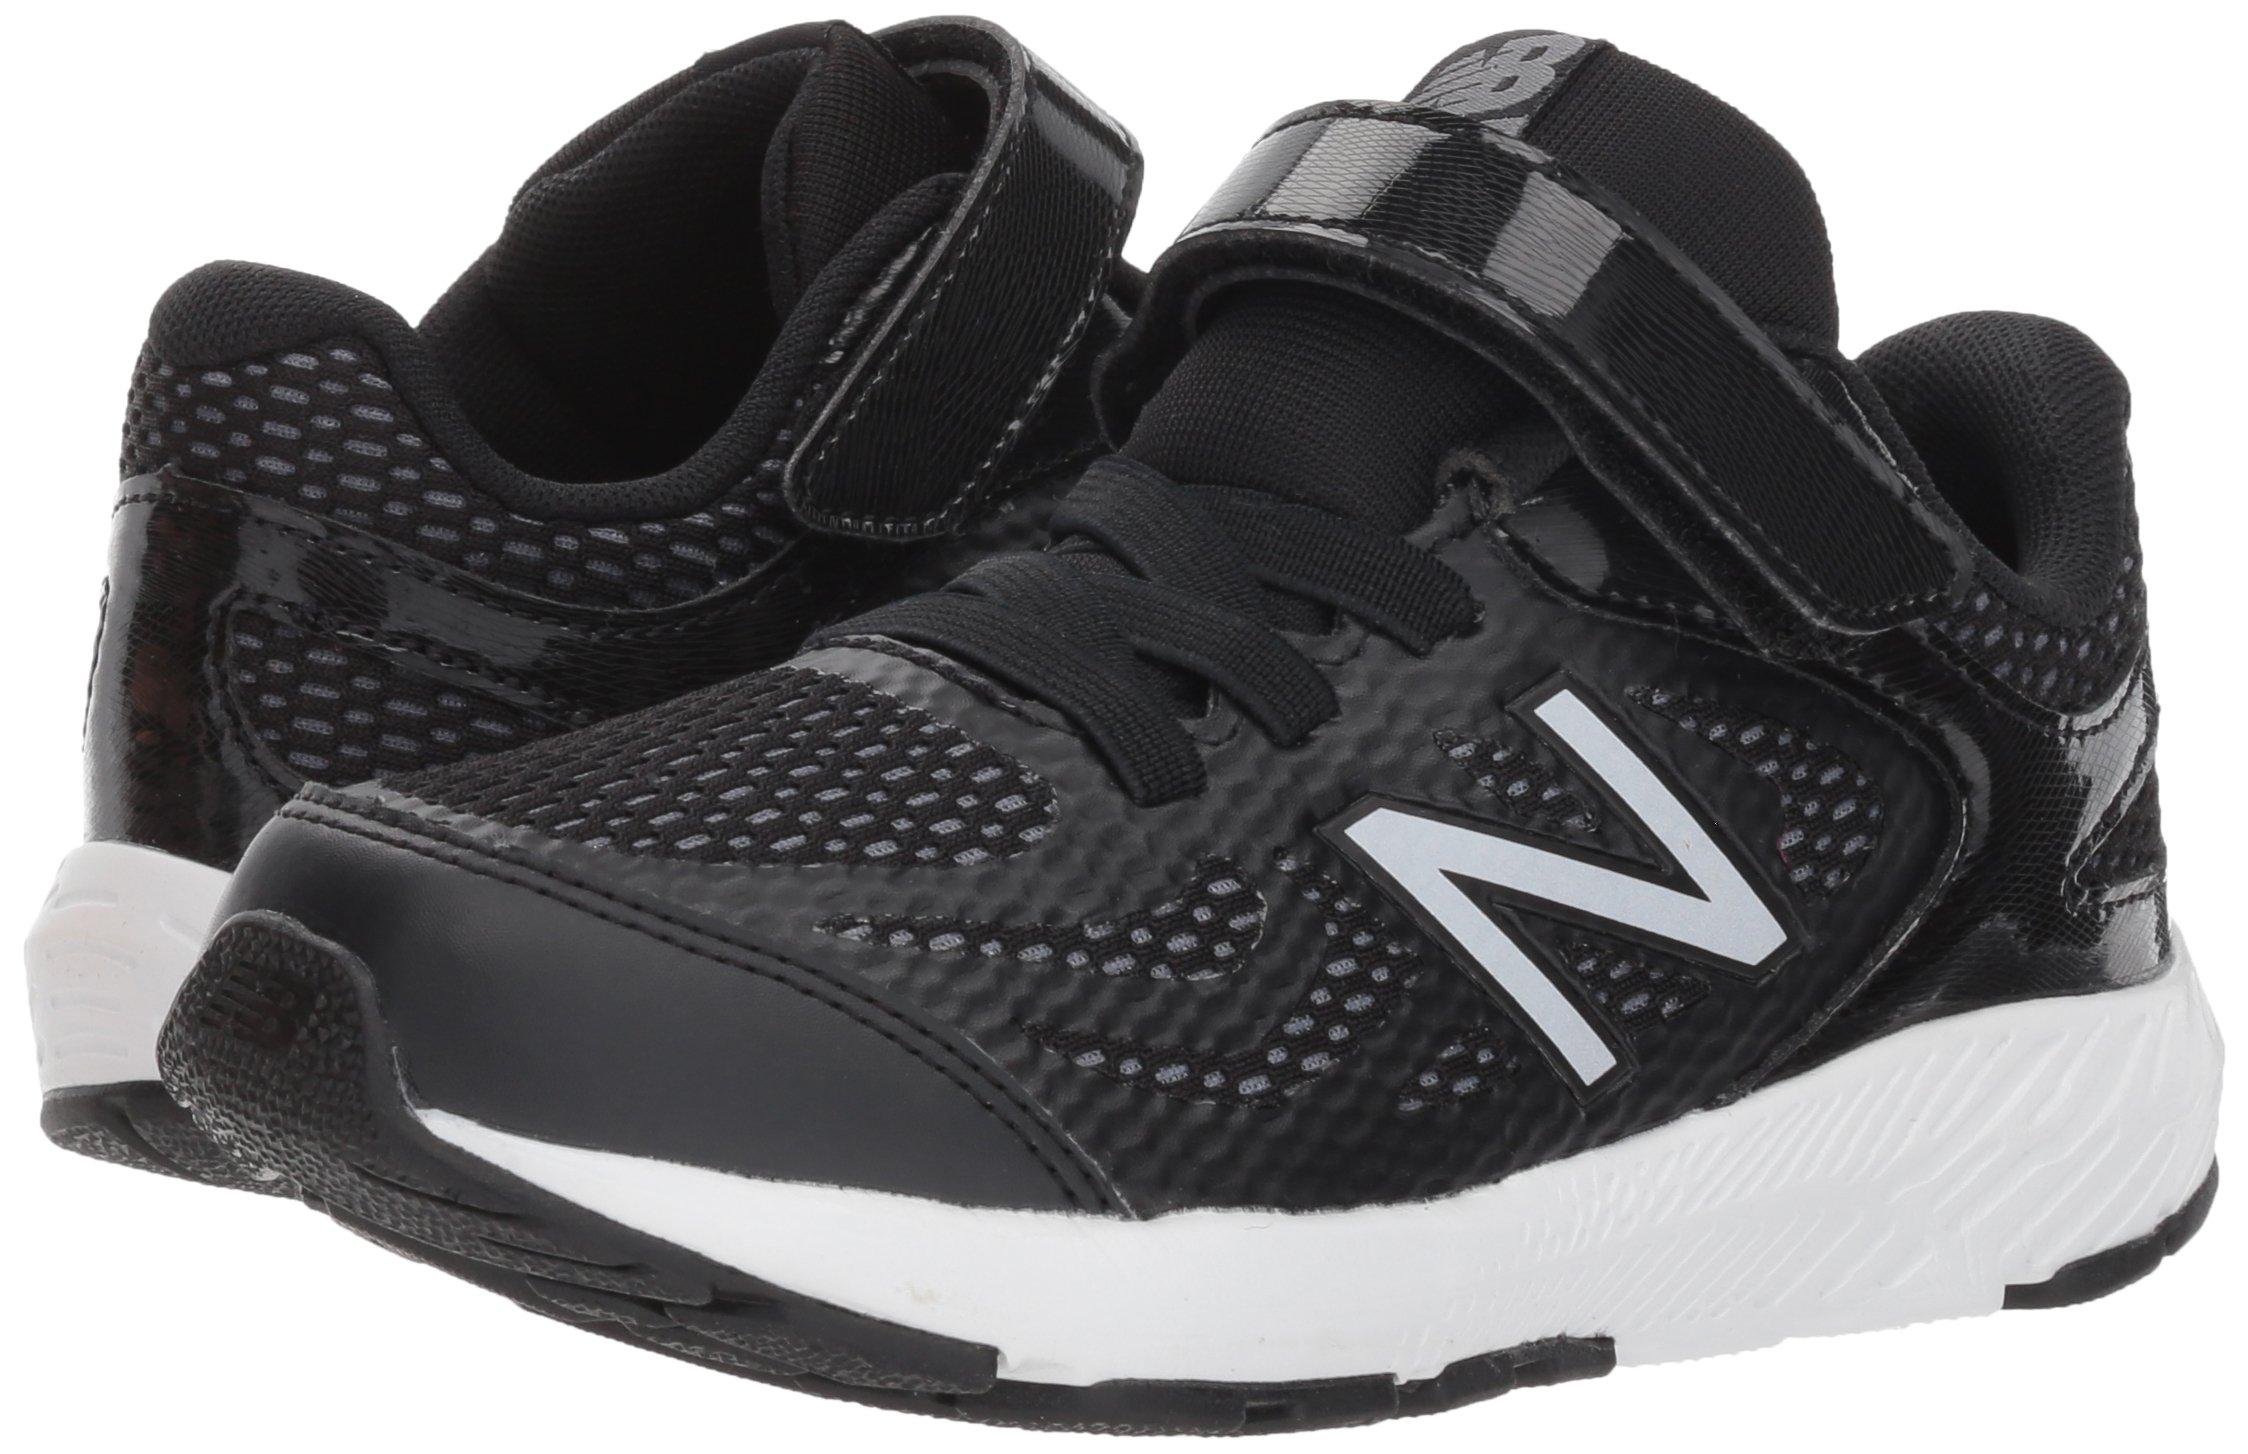 New Balance Boys' 519v1 Hook and Loop Running Shoe Black/White 2 M US Infant by New Balance (Image #6)